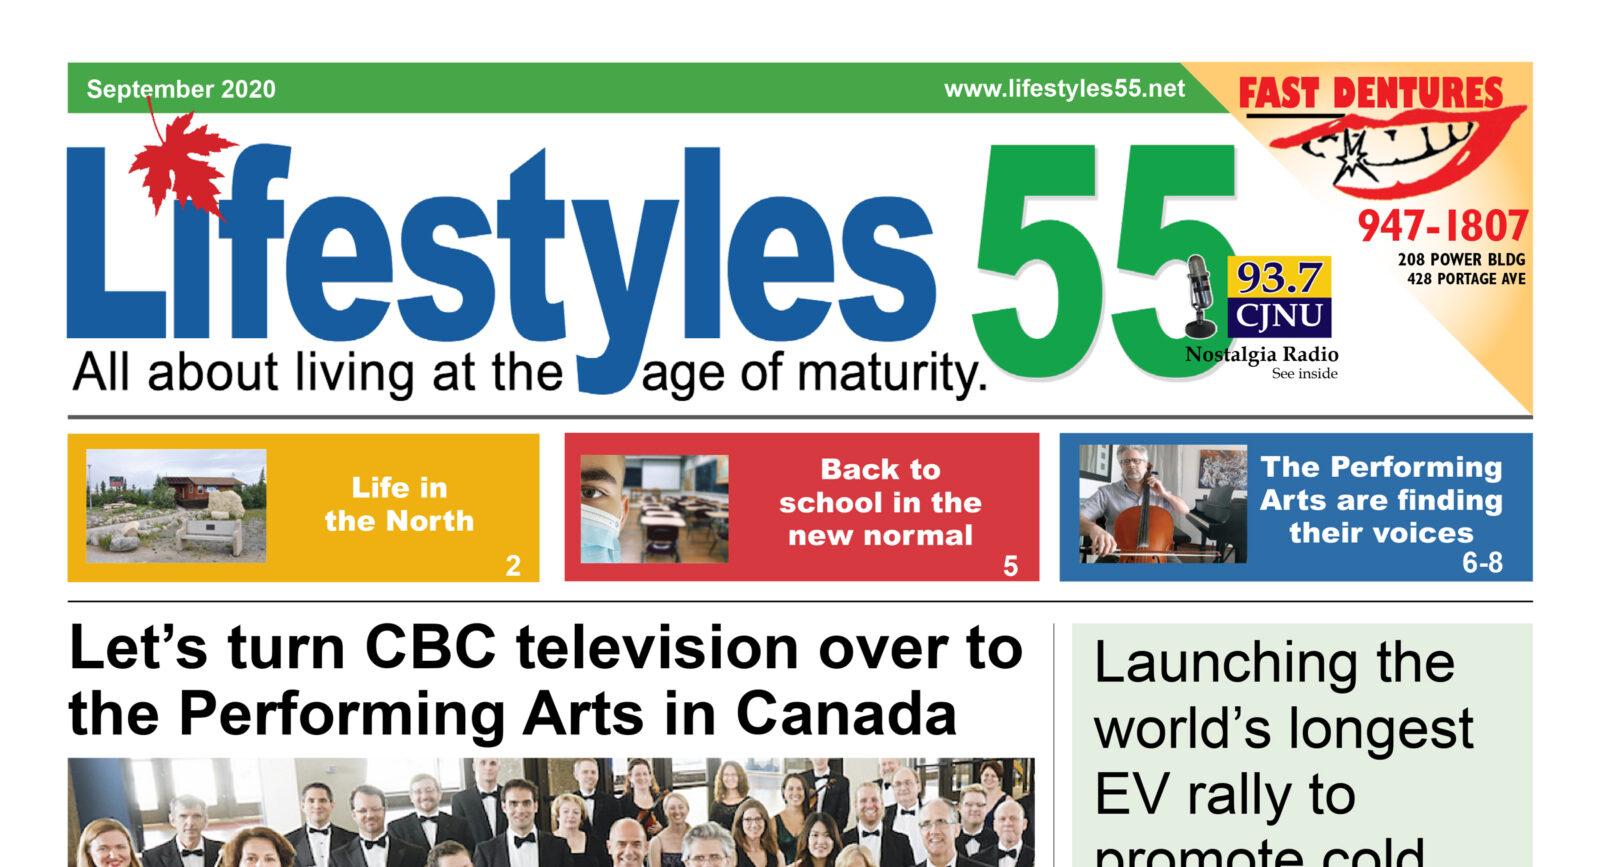 Lifestyles 55 September 2020